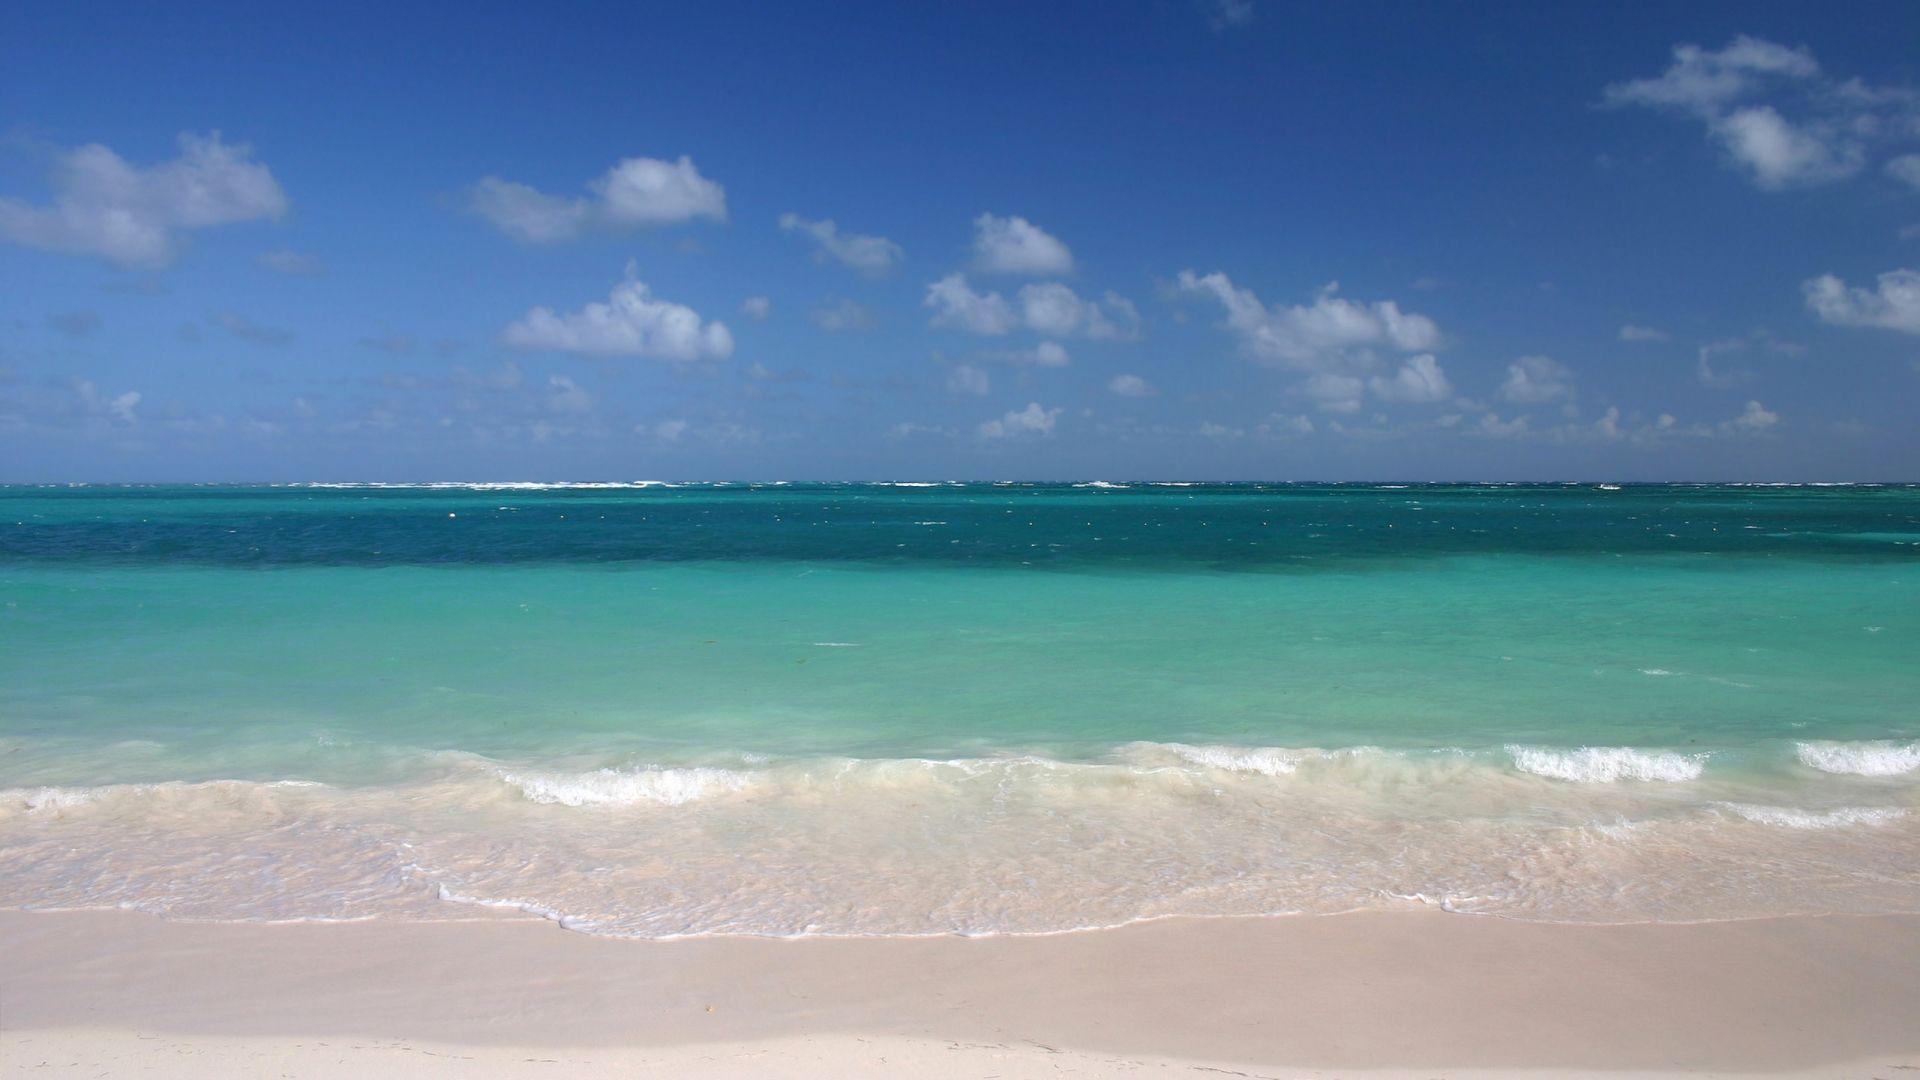 Beach Scenes wallpaper   477283 1920x1080